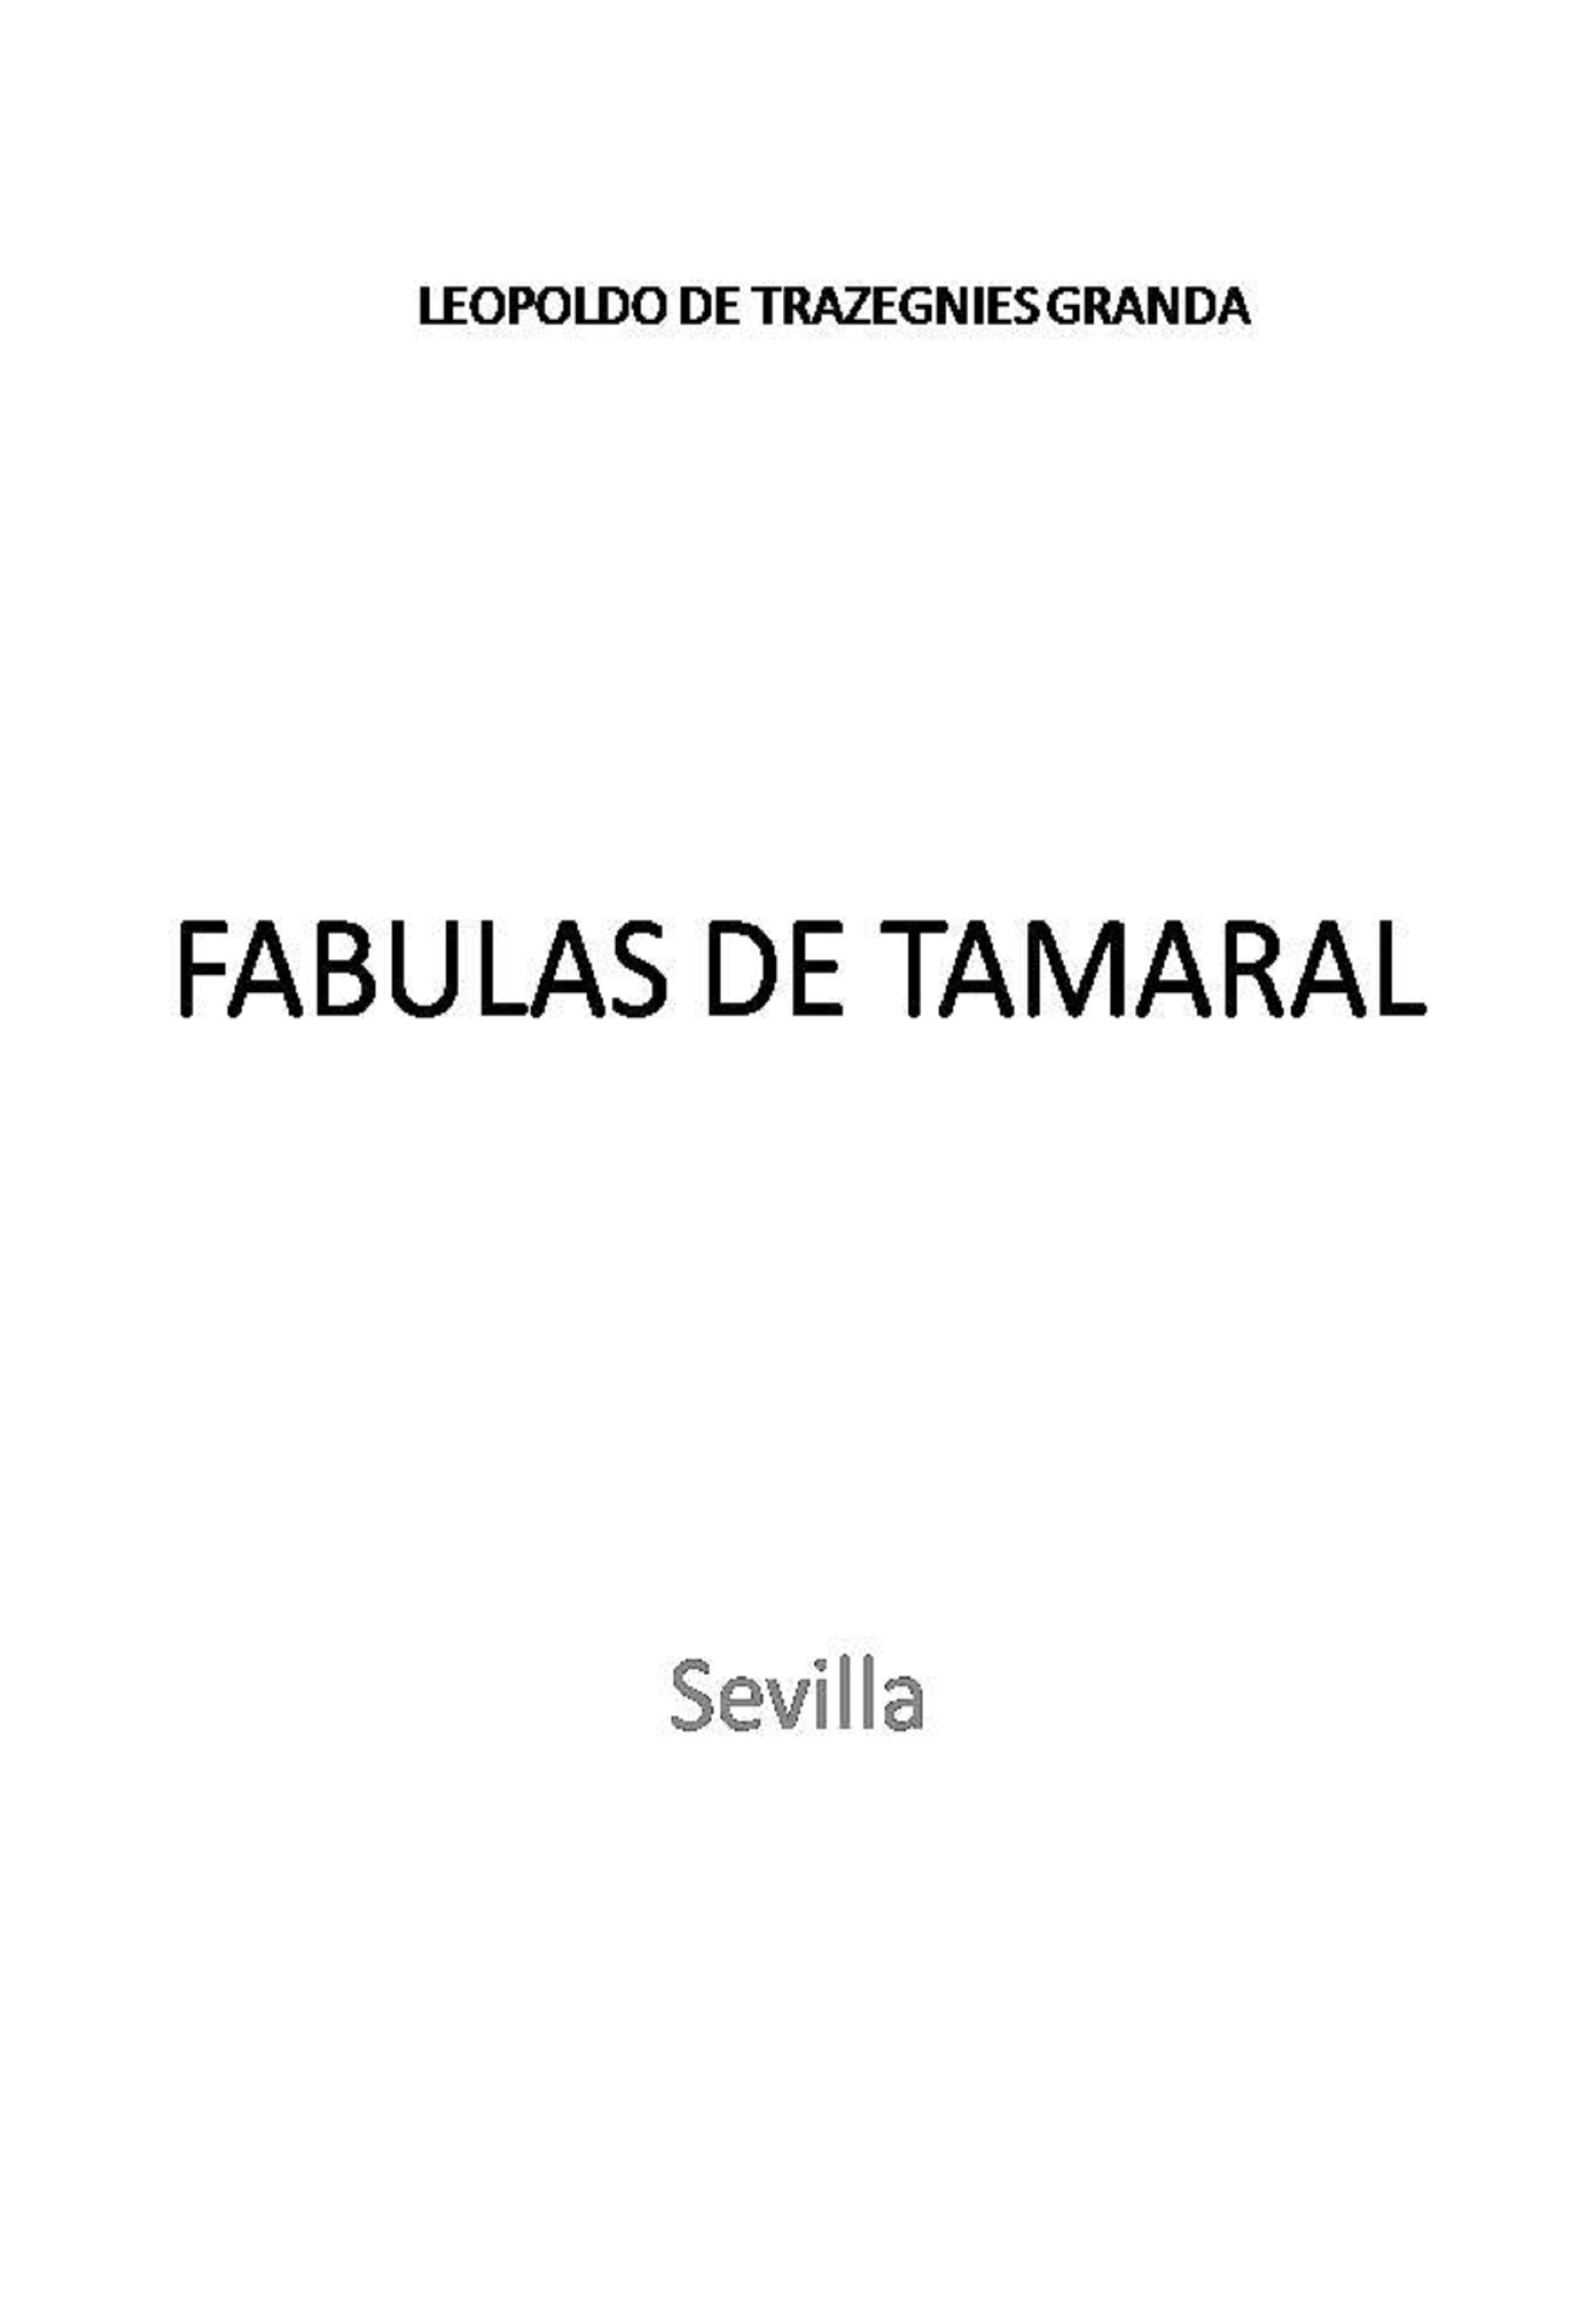 Fábulas de Tamaral